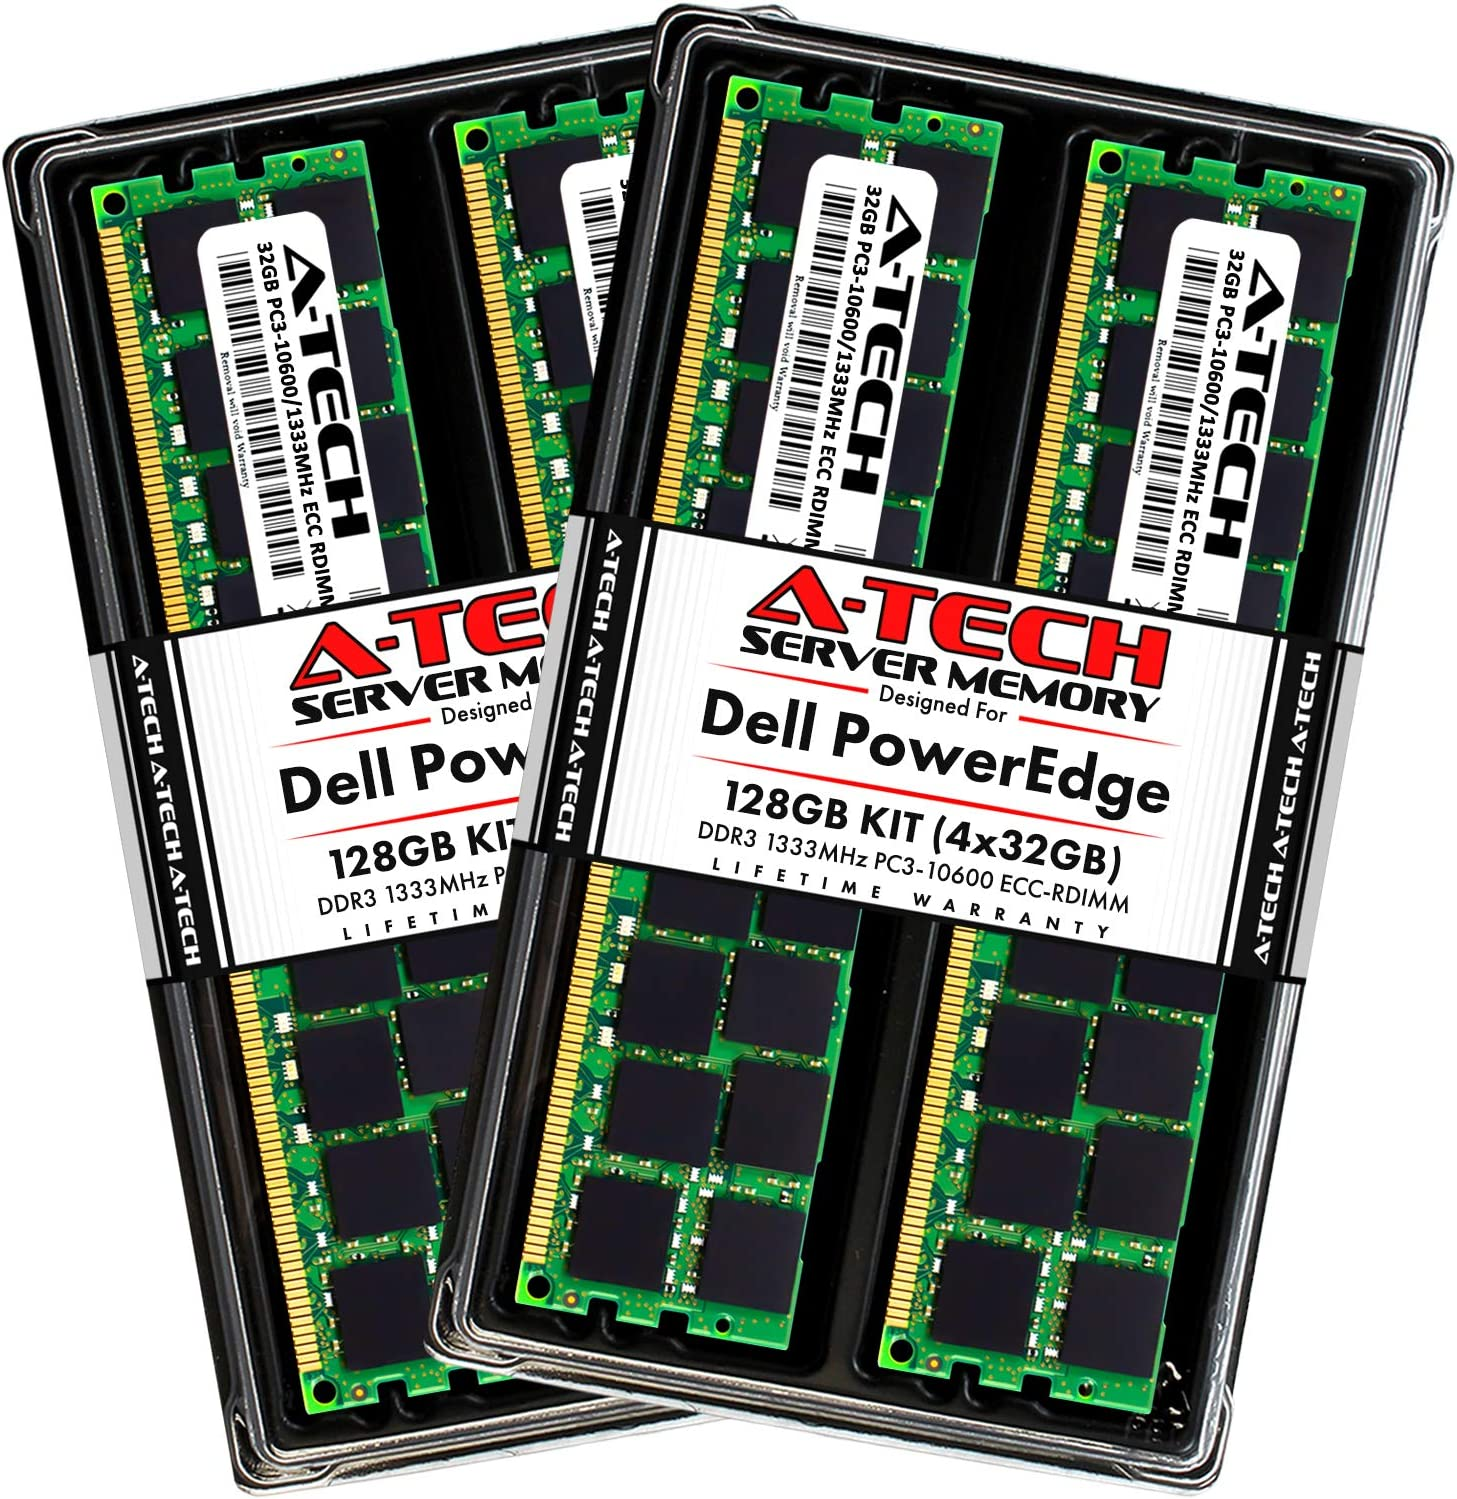 A-Tech 128GB (4x32GB) RAM for Dell PowerEdge T320, T420, T620 Tower Servers   DDR3 1333MHz ECC-RDIMM PC3-10600 4Rx4 1.5V 240-Pin ECC Registered DIMM Server Memory Upgrade Kit